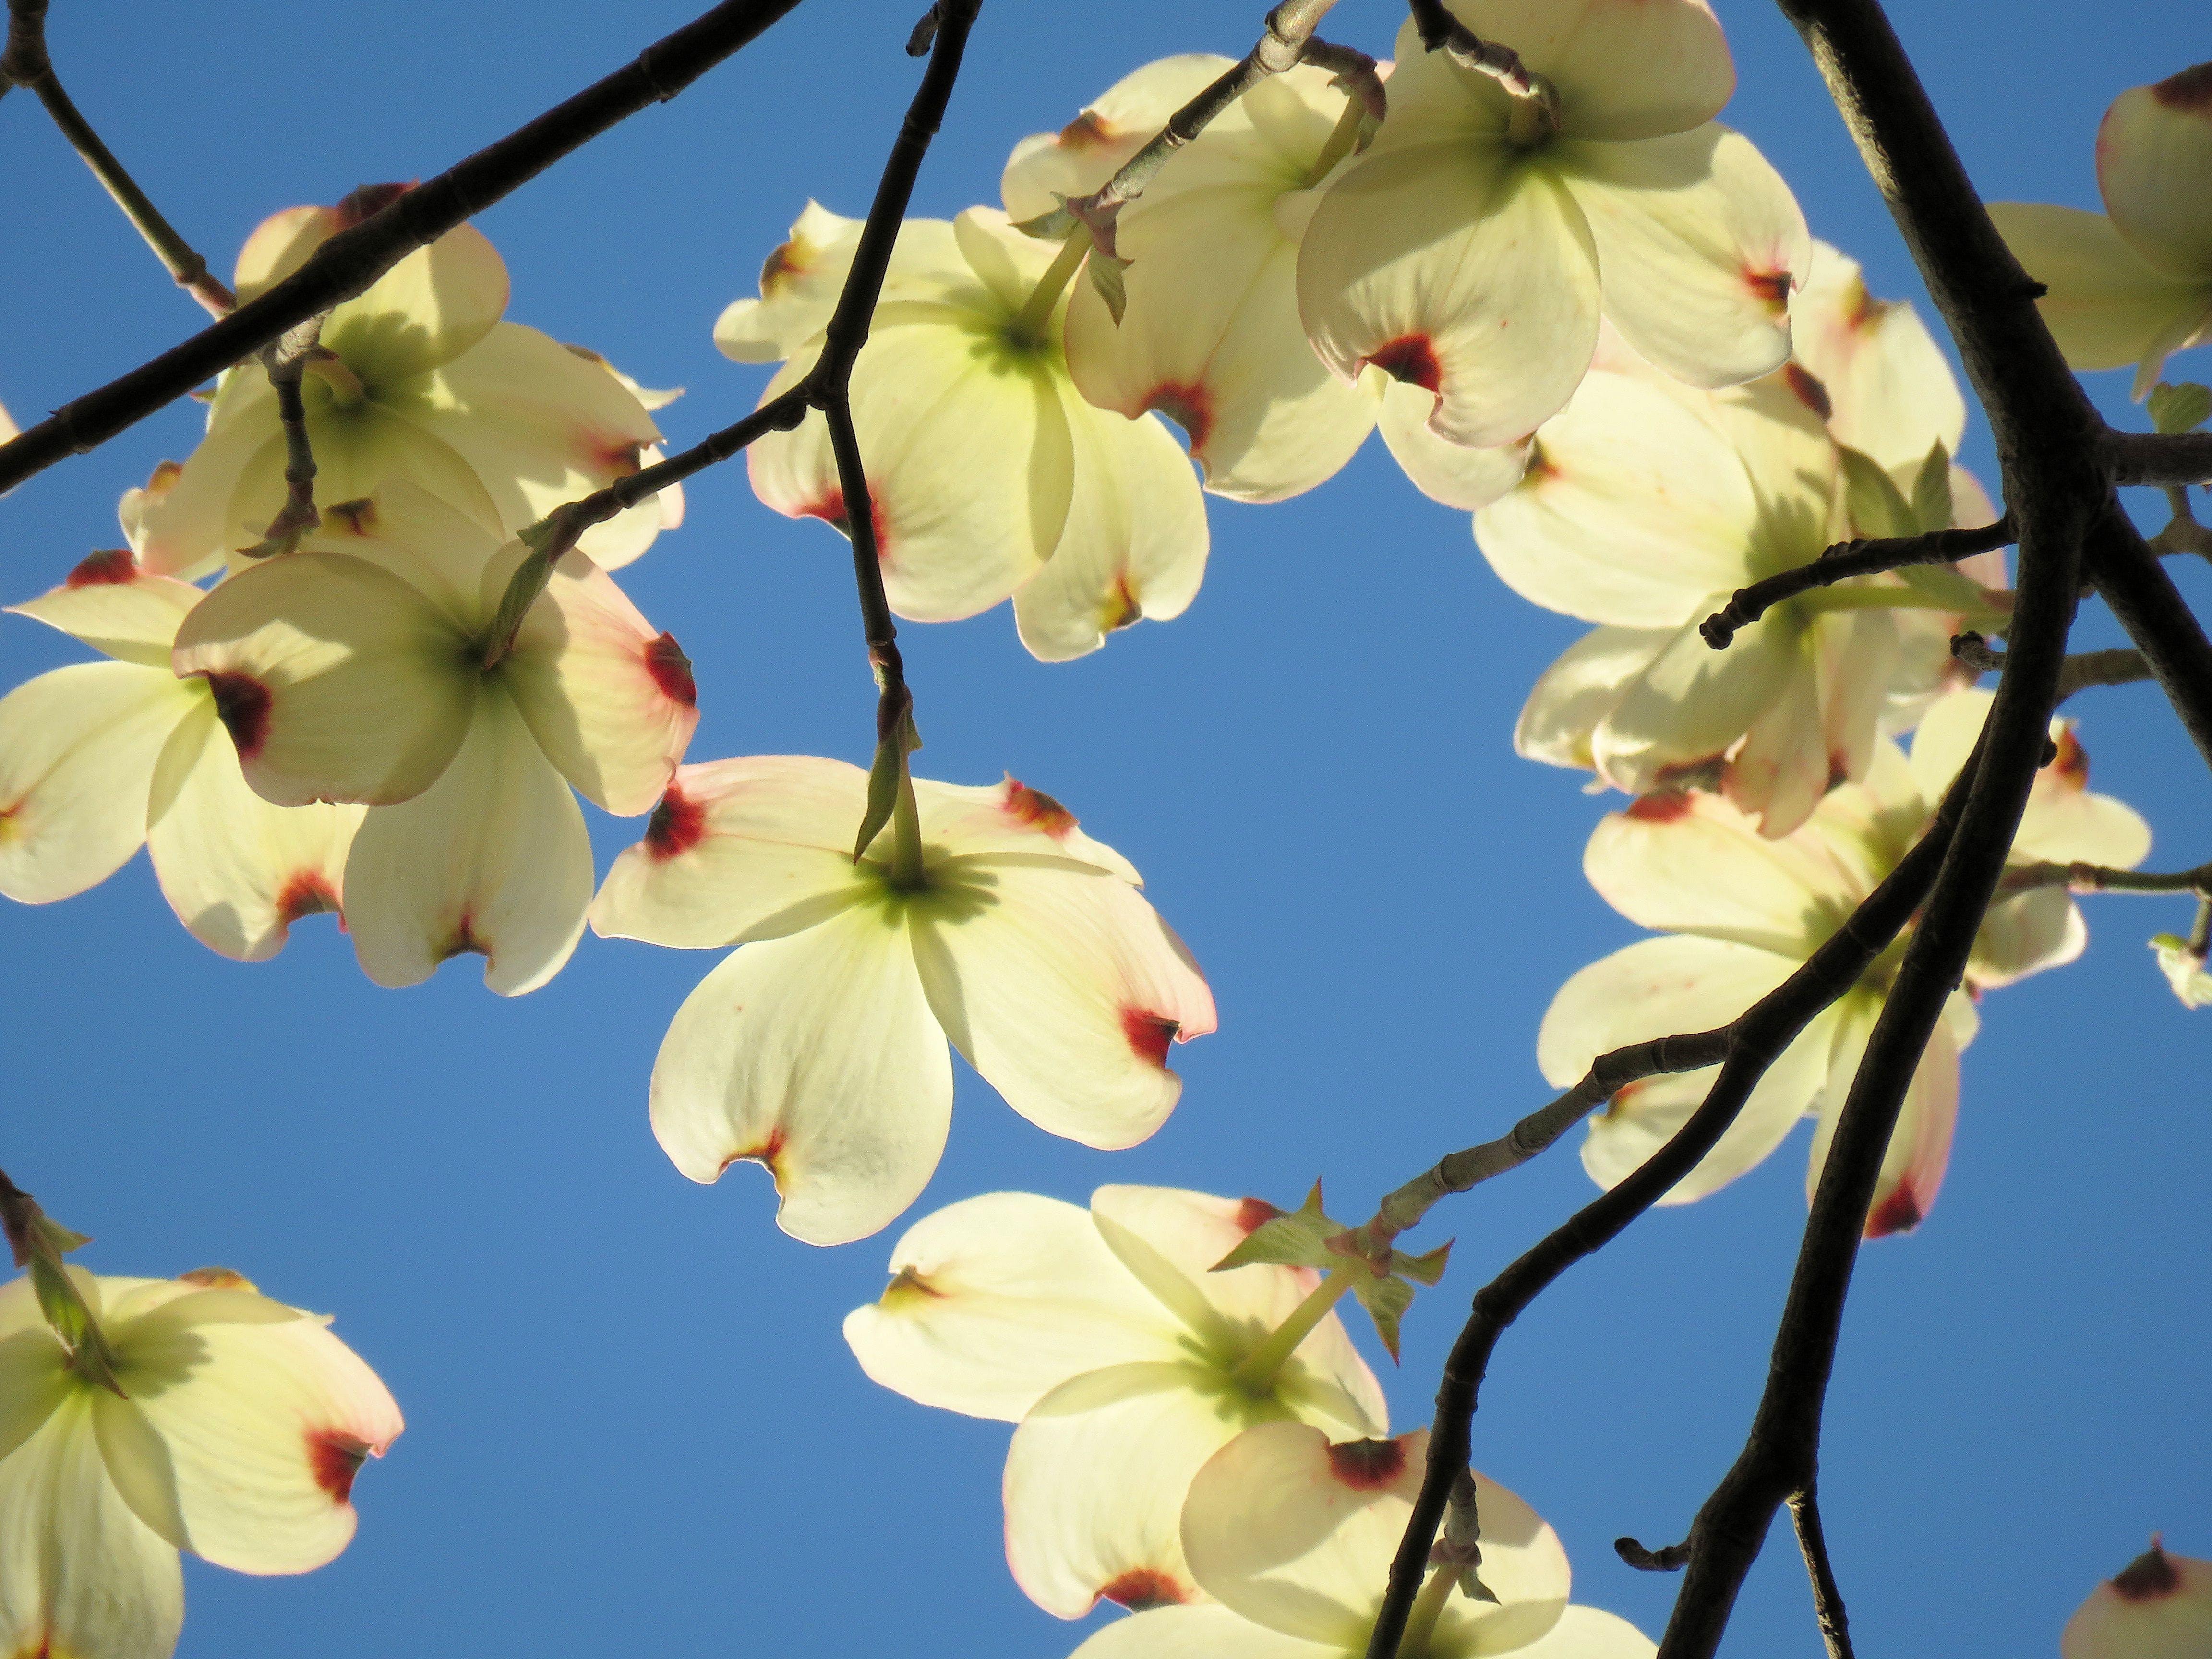 Free stock photo of flowers, spring, blue sky, dogwood